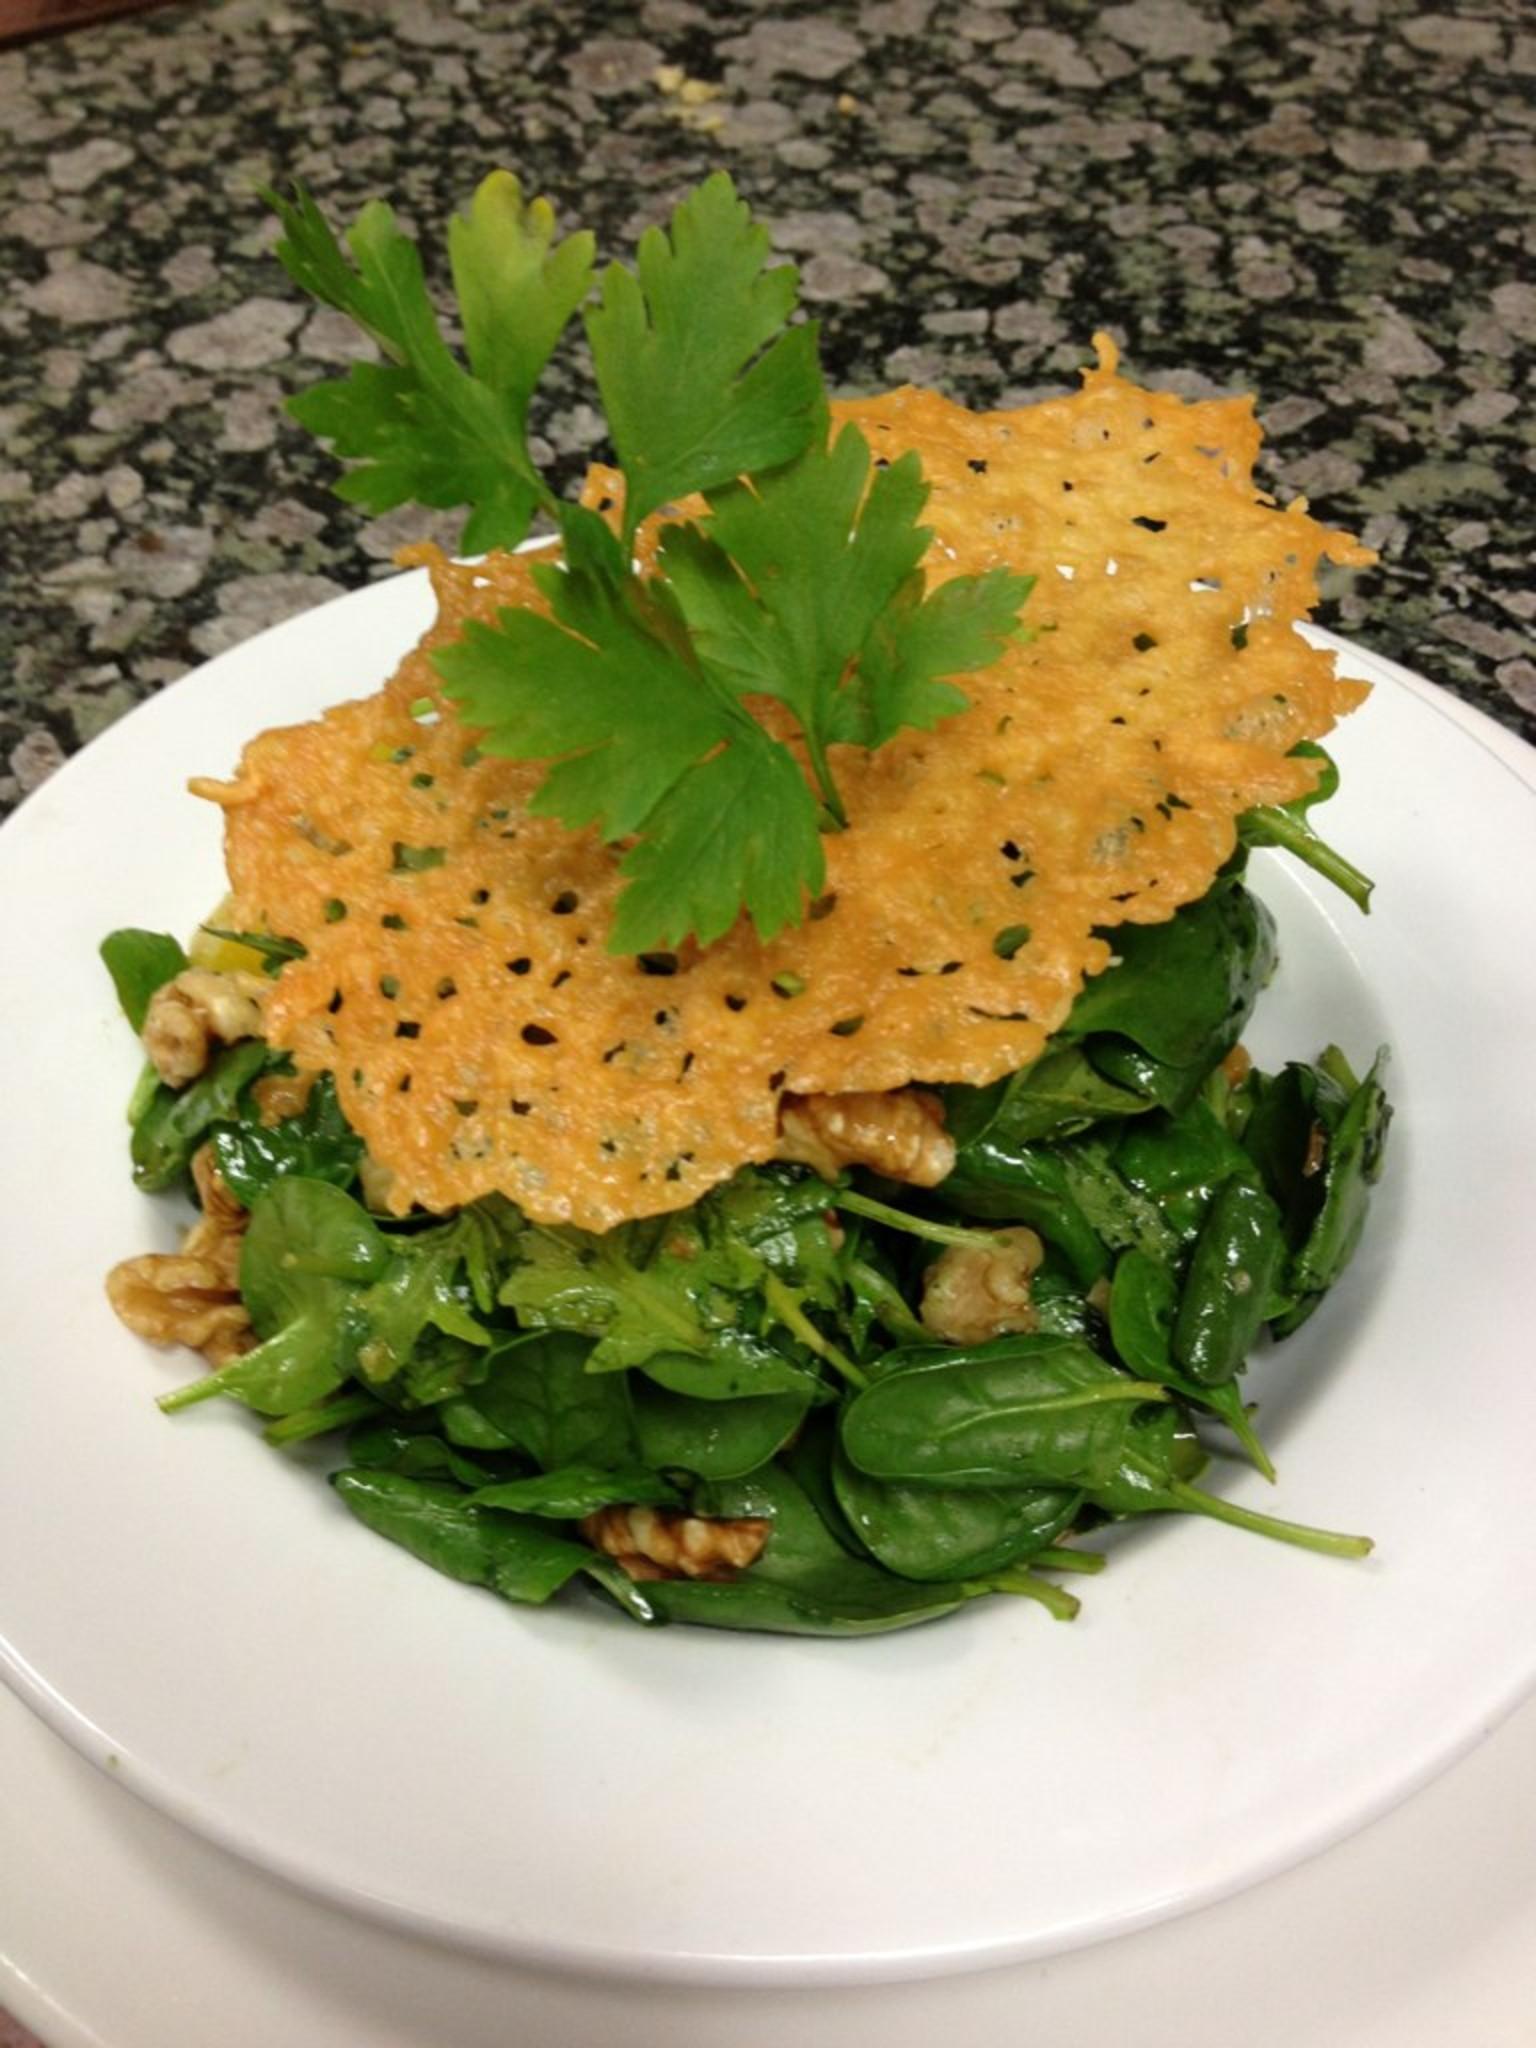 9795 spinach salad with saffron - مكونات سلطة سبانخ بالزعفران